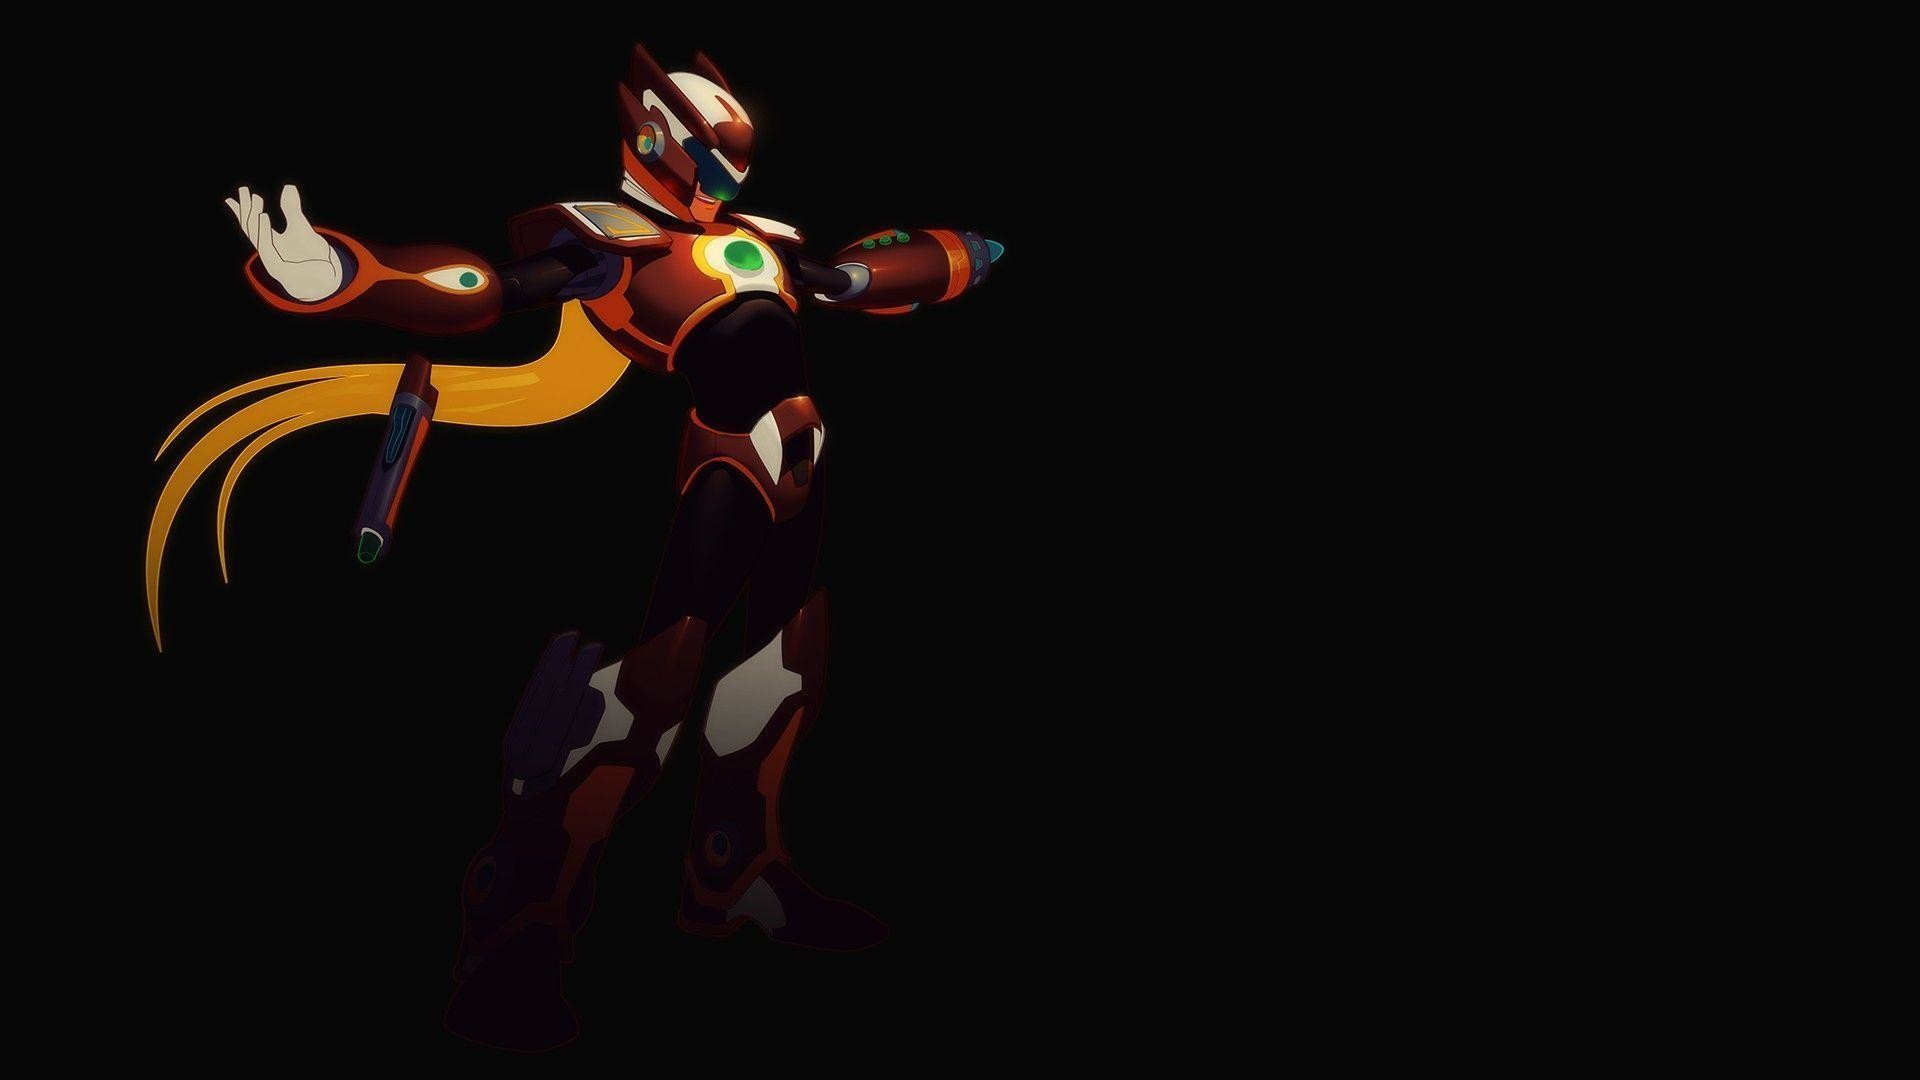 Proto Man Mega Man Black wallpaper | | 78900 | WallpaperUP